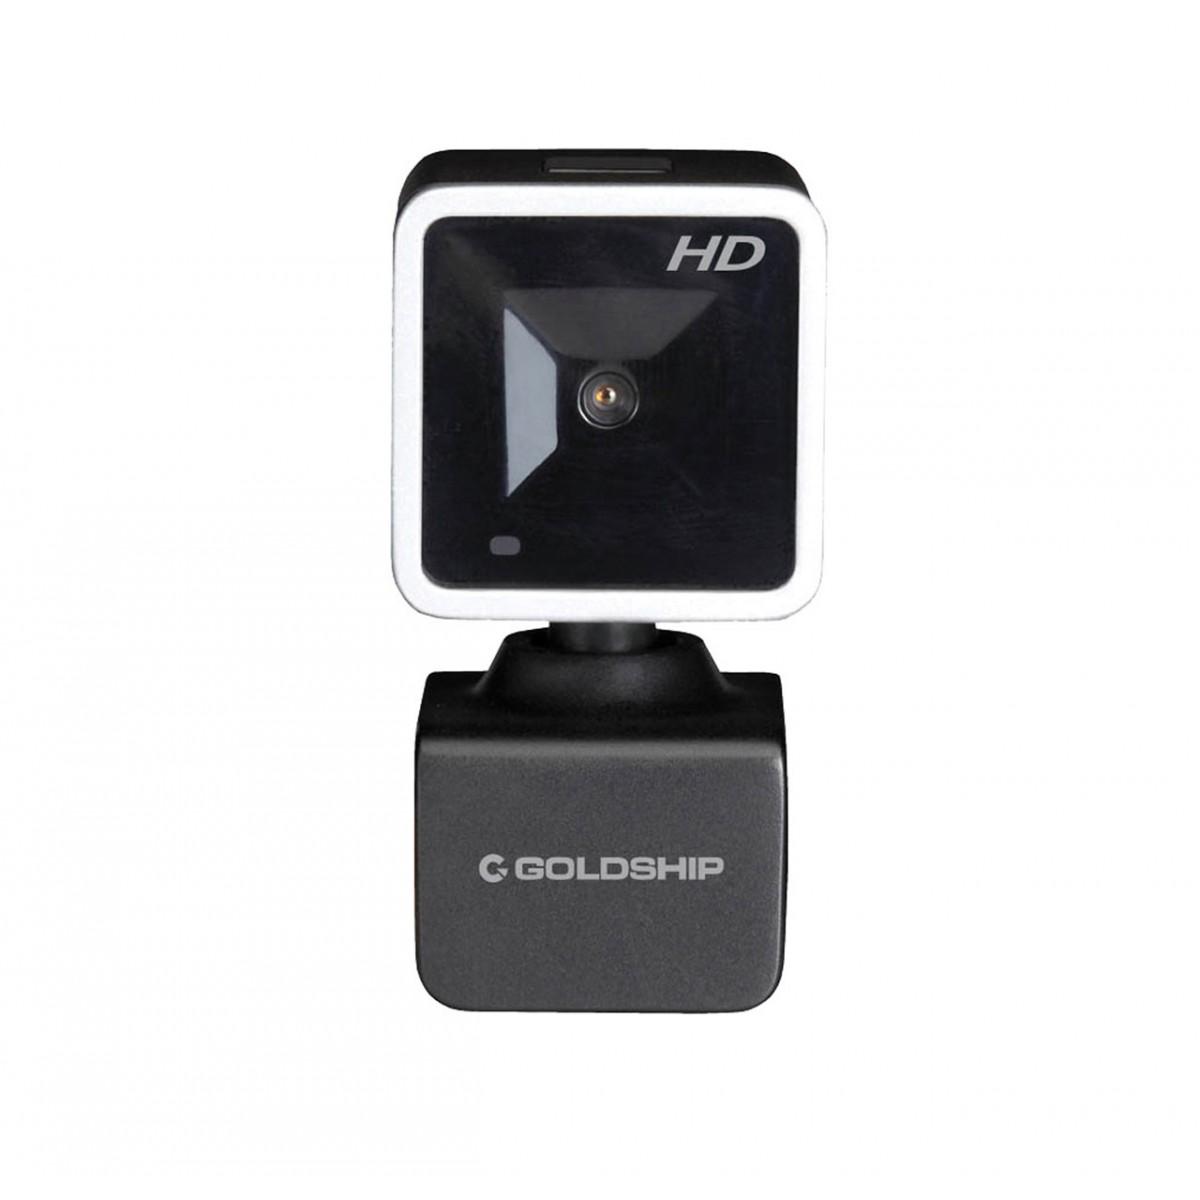 Webcam HD Resolusao Maxima 720p 3808 - Leadership